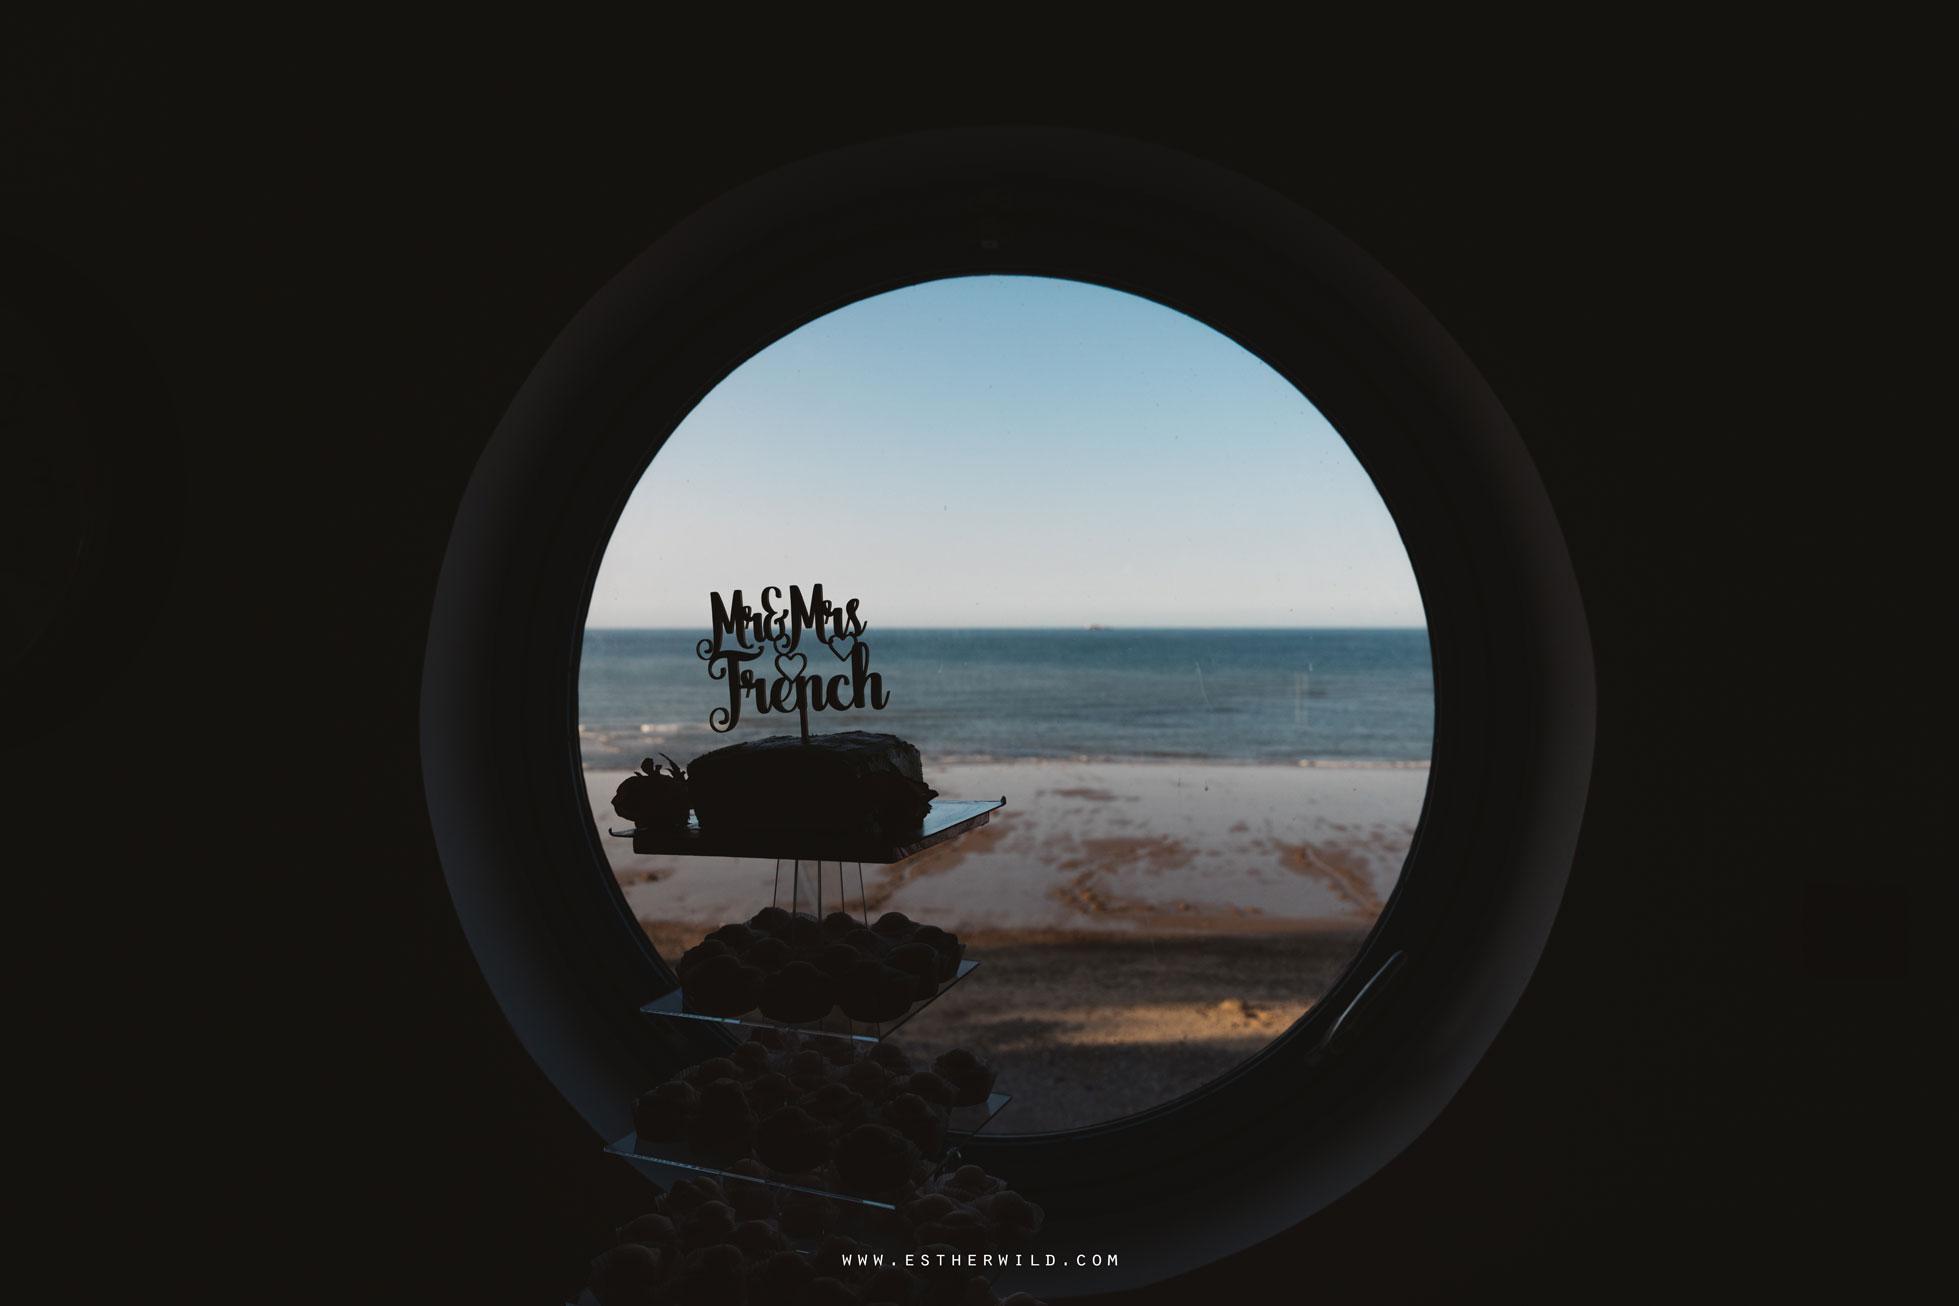 Cromer_Wedding_Beach_Outdoor_Ceremony_Norfolk_North_Lodge_Registry_Office_Rocket_House_Cafe_Cromer_Pier_IMG_4829.jpg